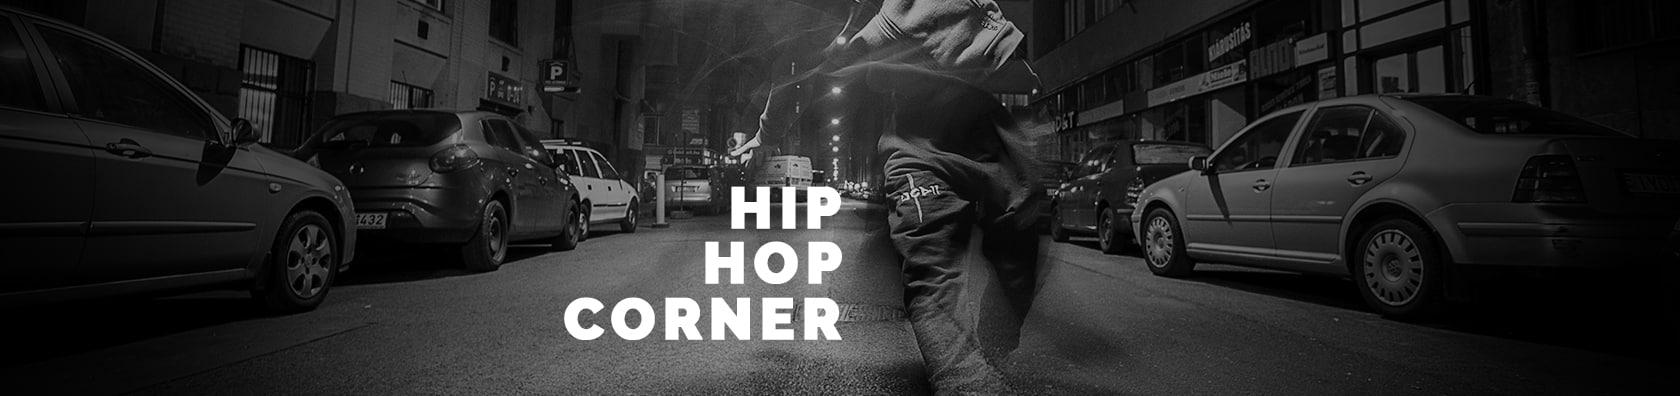 image soonvibes cover hip hop corner